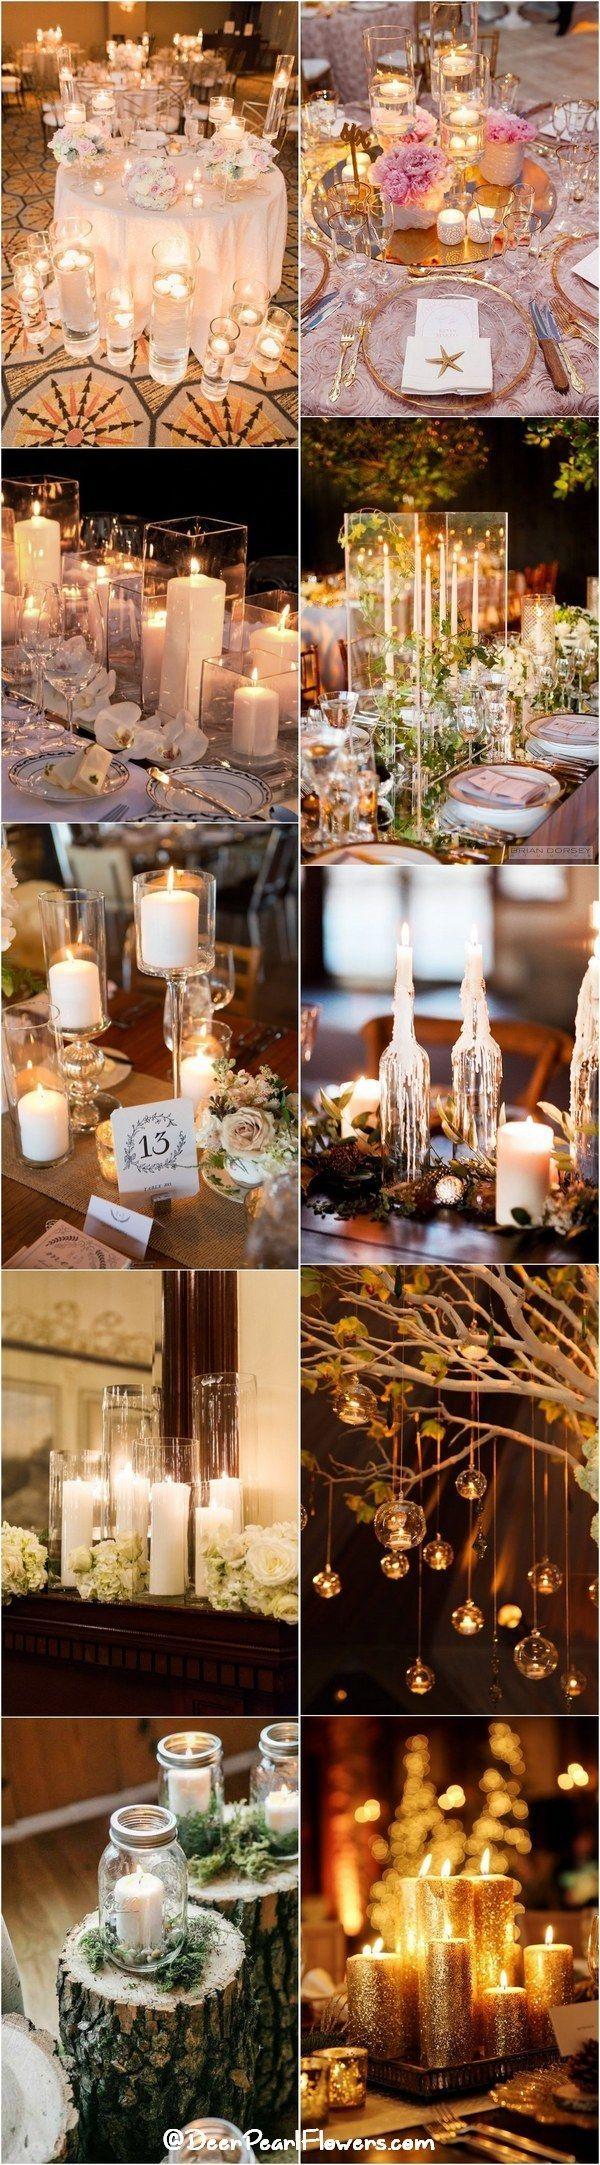 40 Chic Romantic Wedding Ideas Using Candles Romantic Weddings